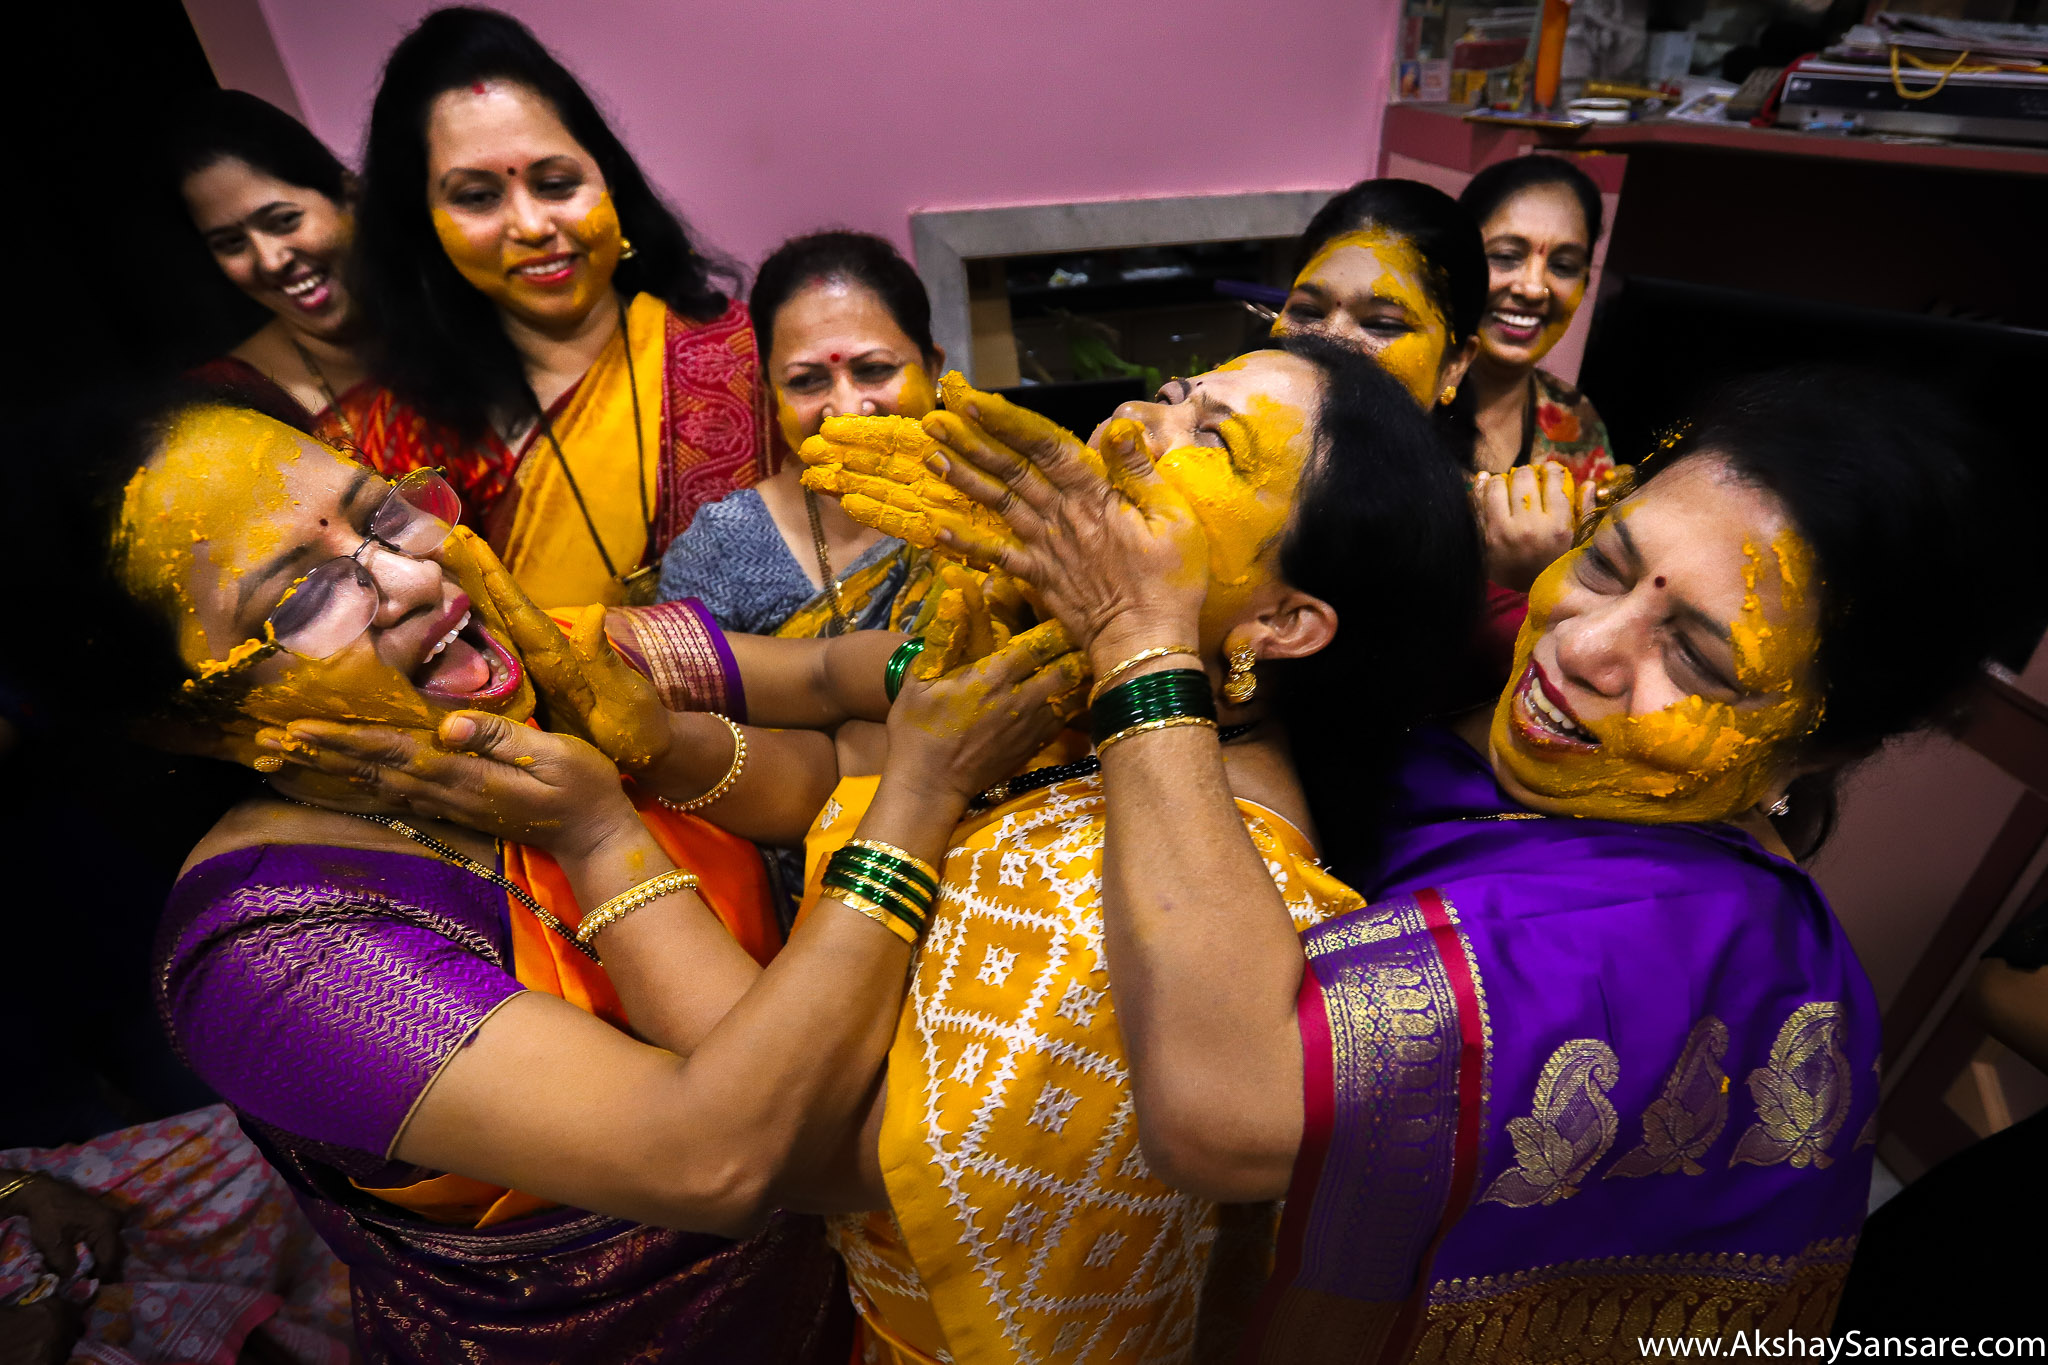 Aditya x Poonam Blog Akshay Sansare Photography Candid Photographer in Mumbai Best Cinematic wedding film filmer-3.jpg